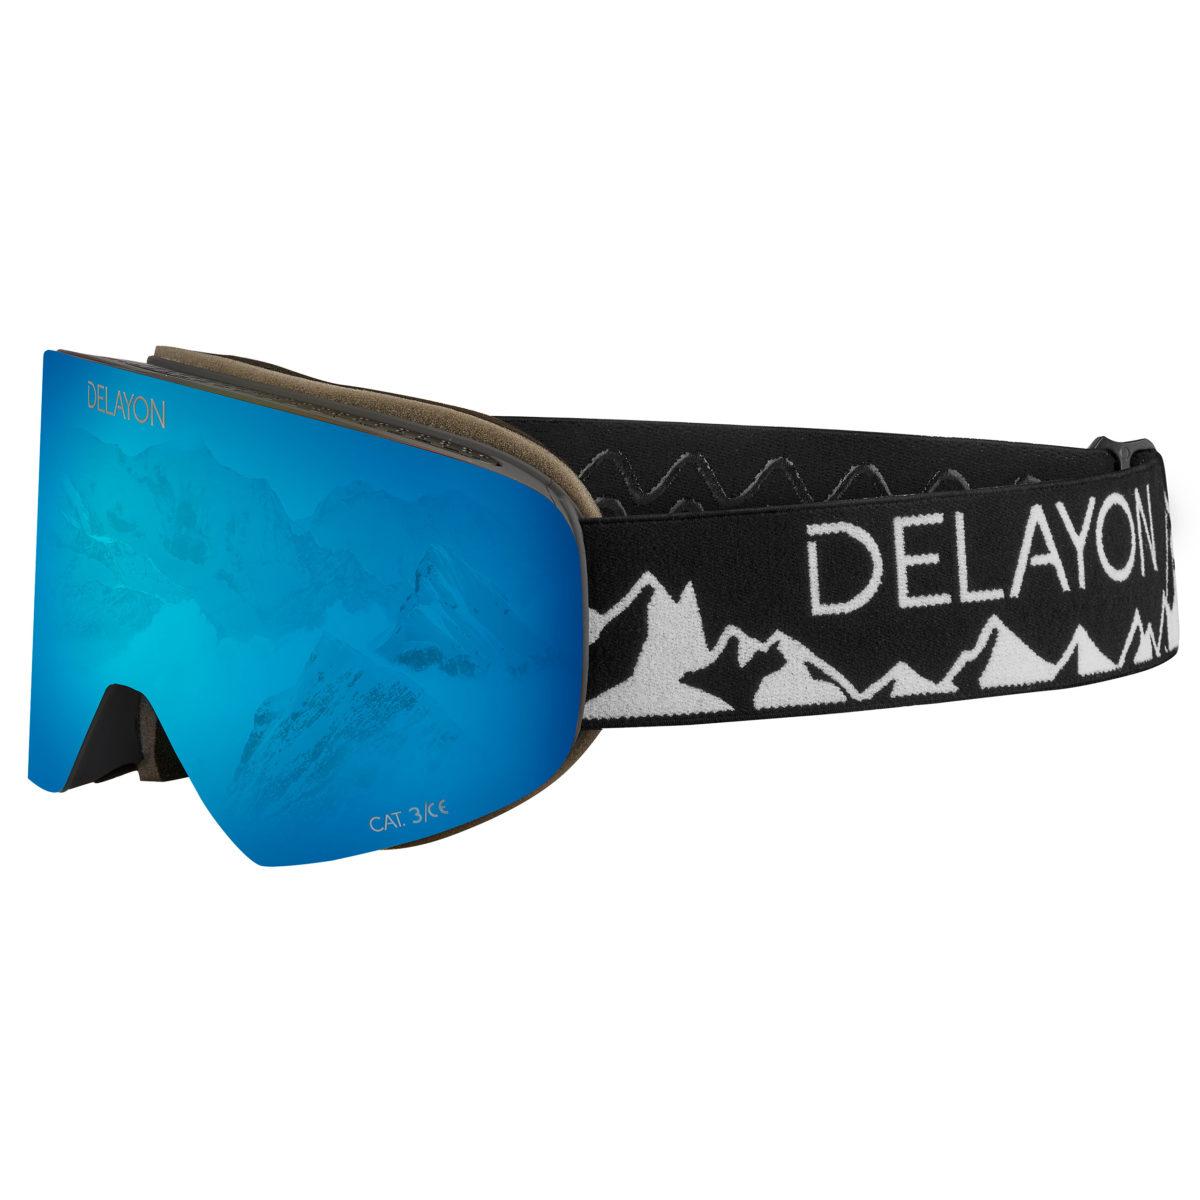 DELAYON Eyewear Tao Kreibich Signature Goggle GoBiq Design